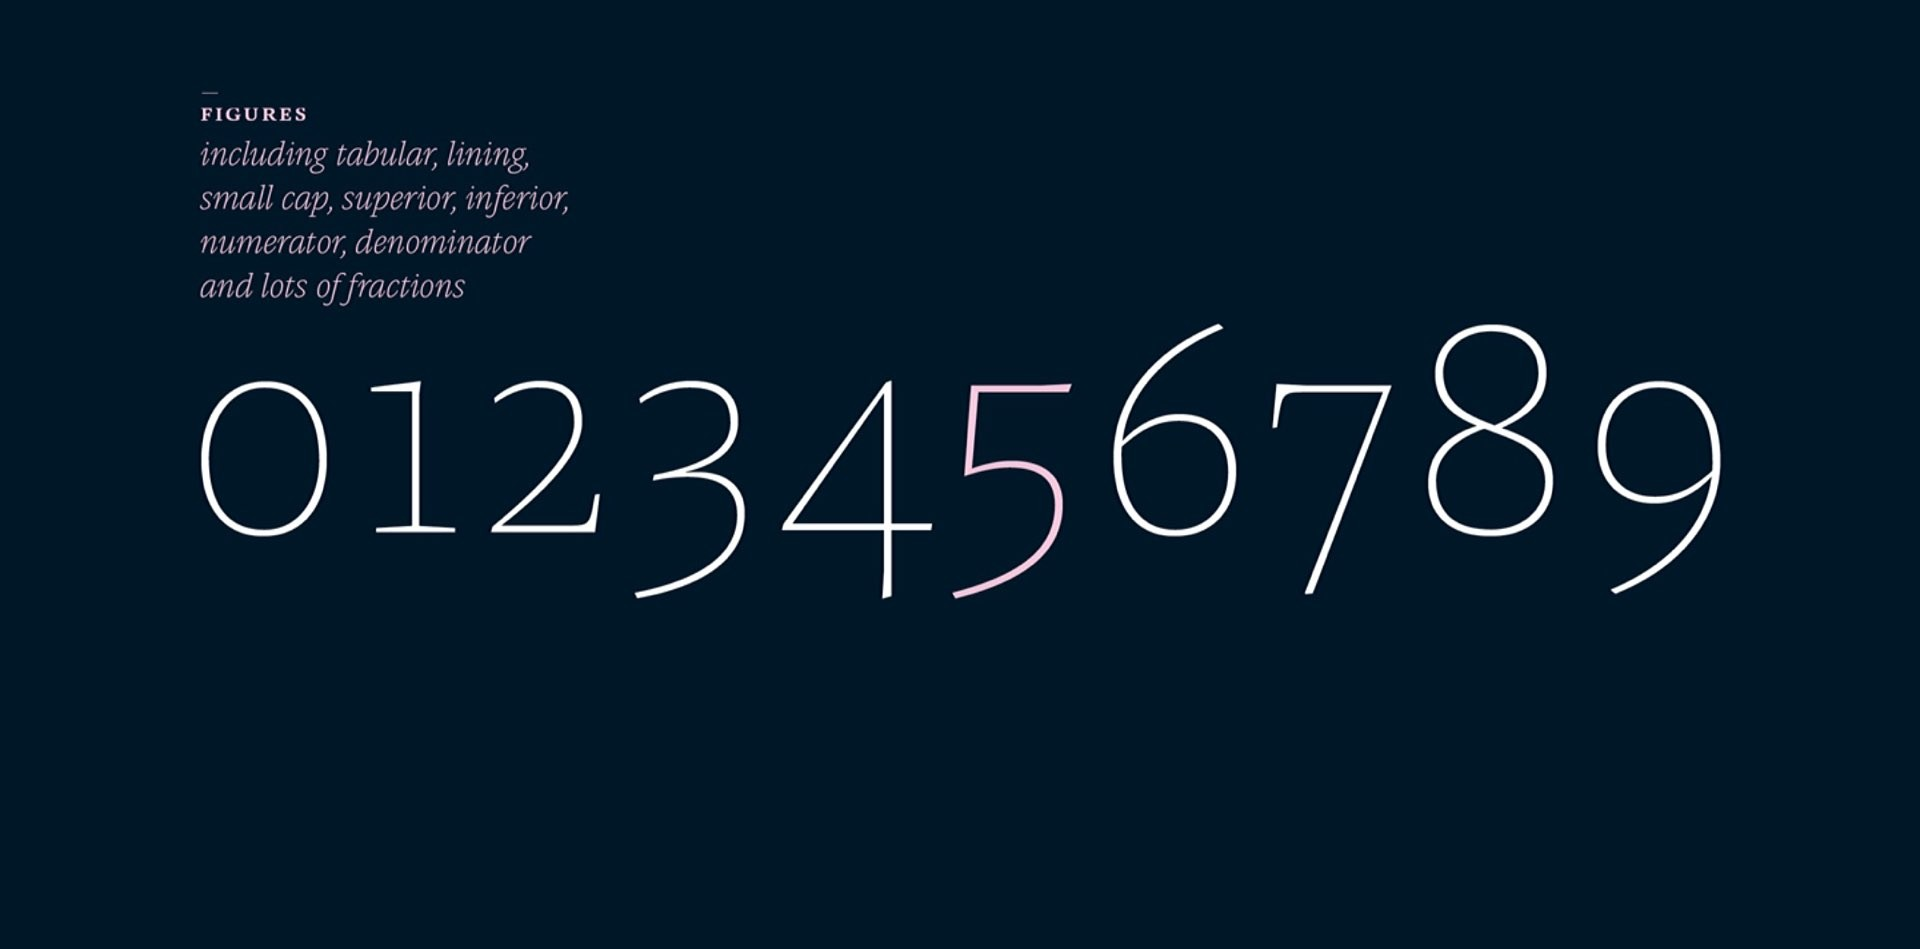 pensum-pro-typeface-by-nils-thomsen-4